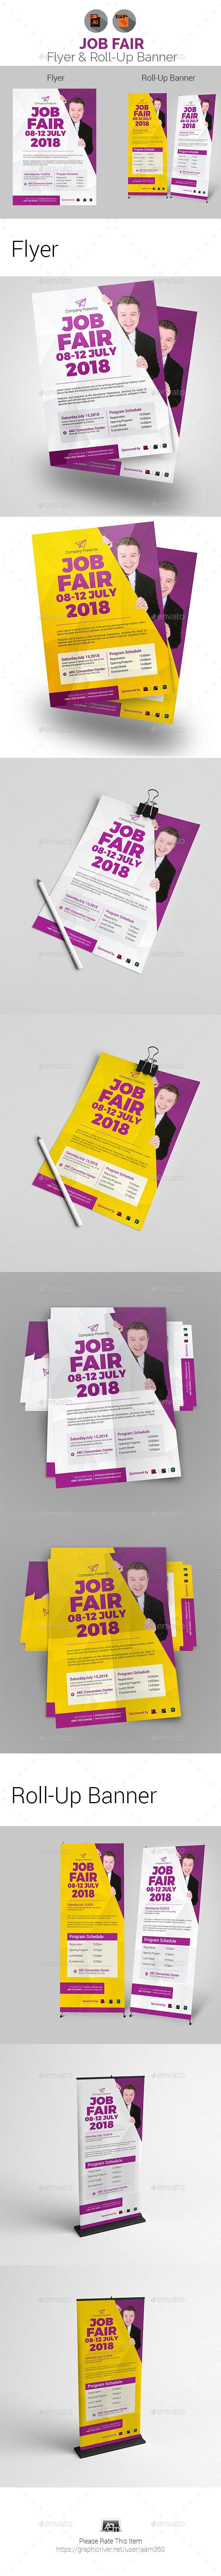 job career fair flyer roll up banner print templates roll up